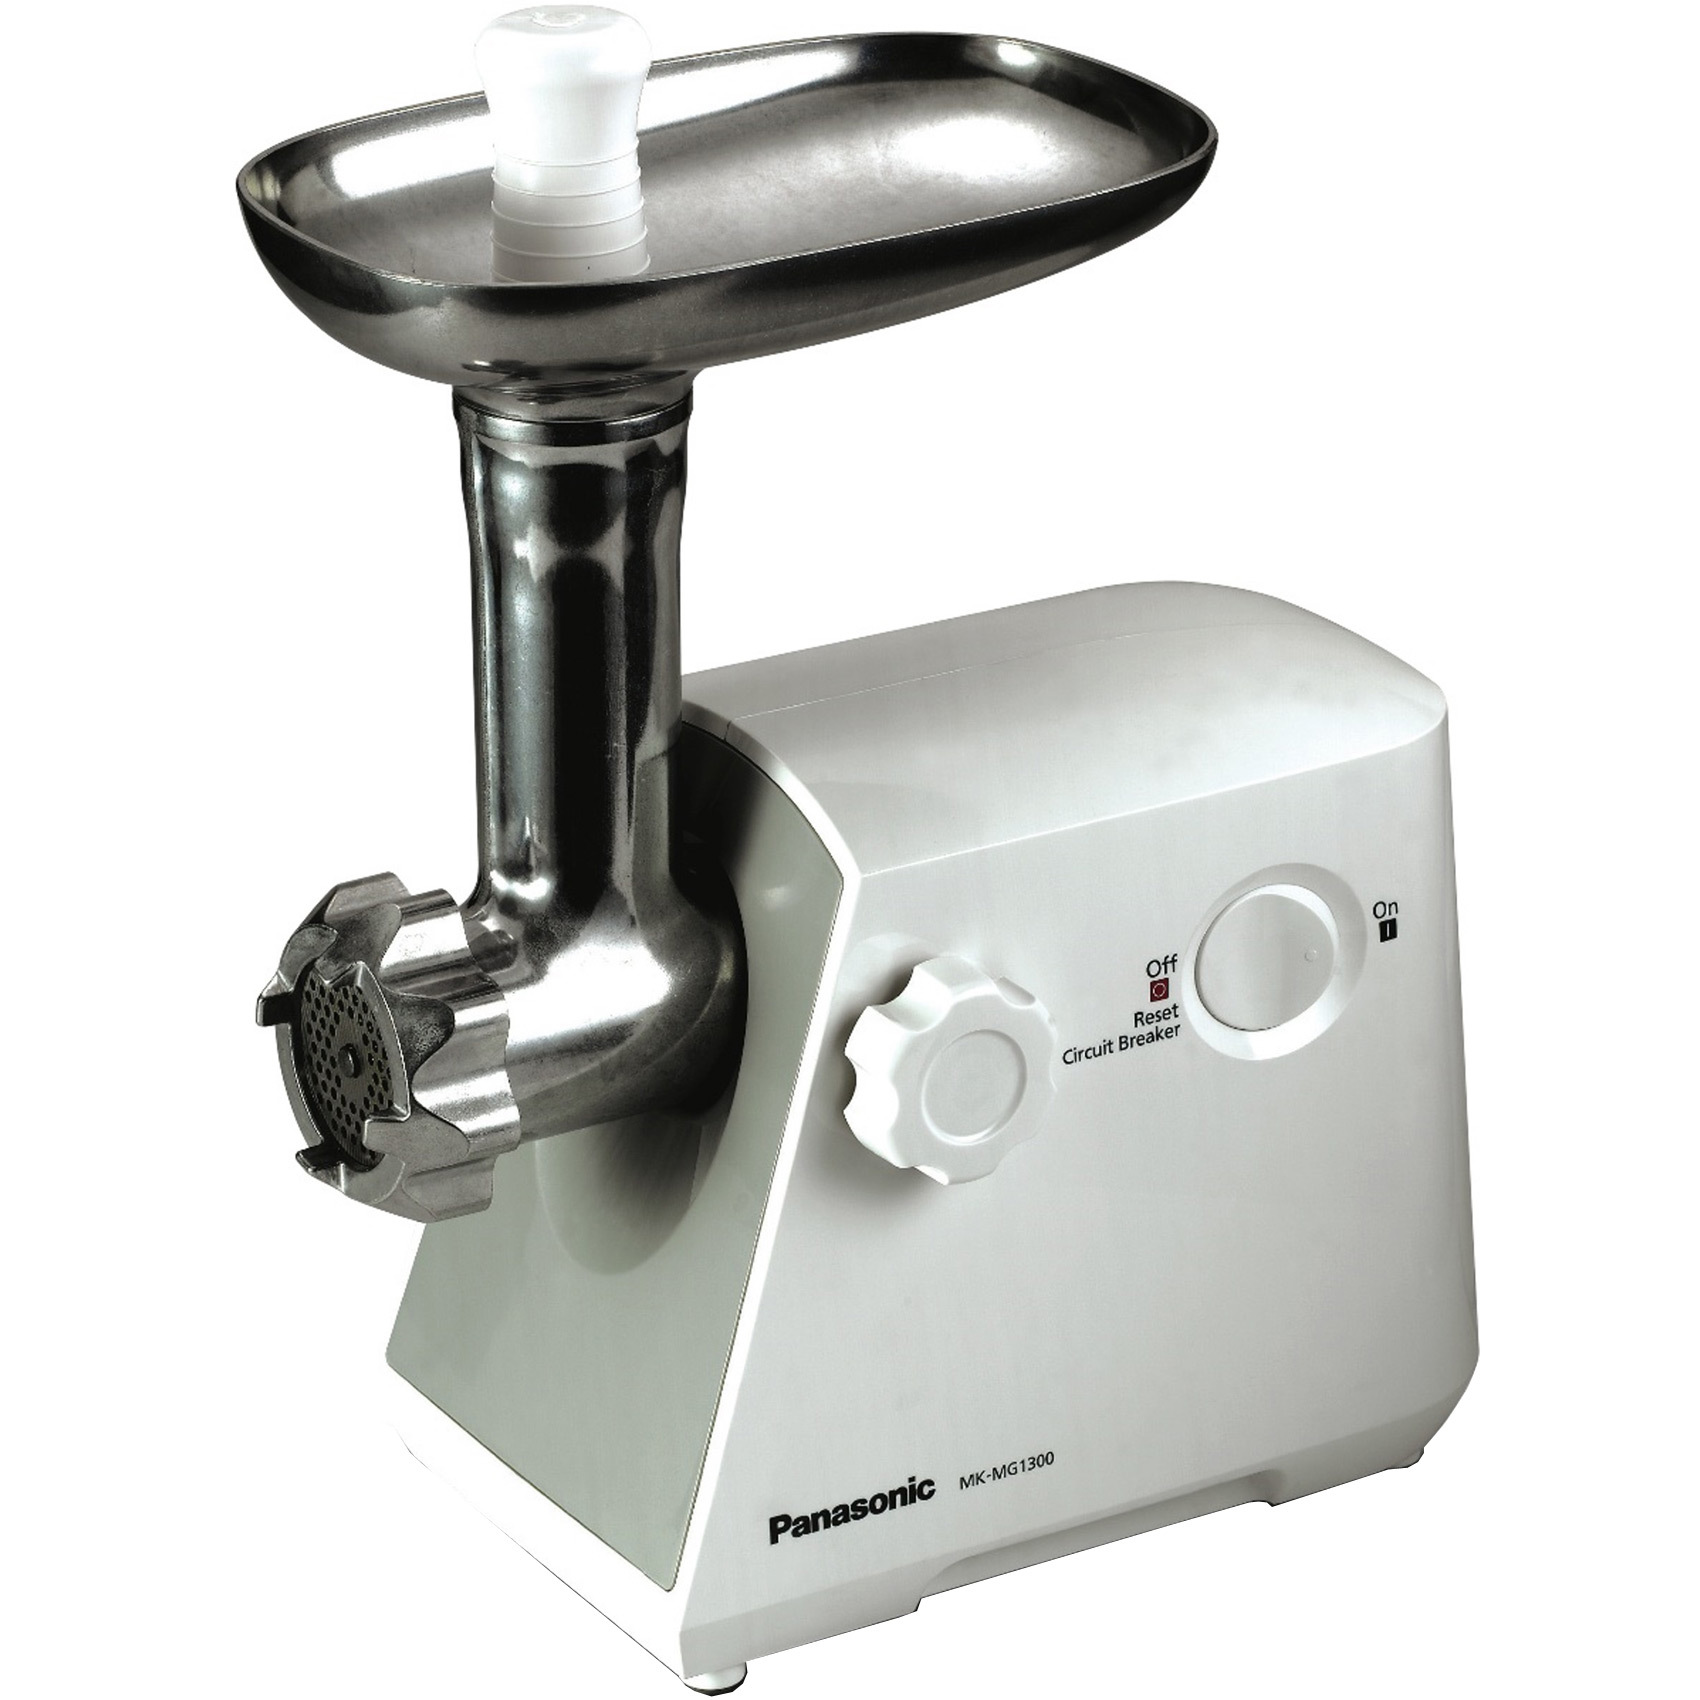 PANASONIC MEAT GRINDER MKMG1300